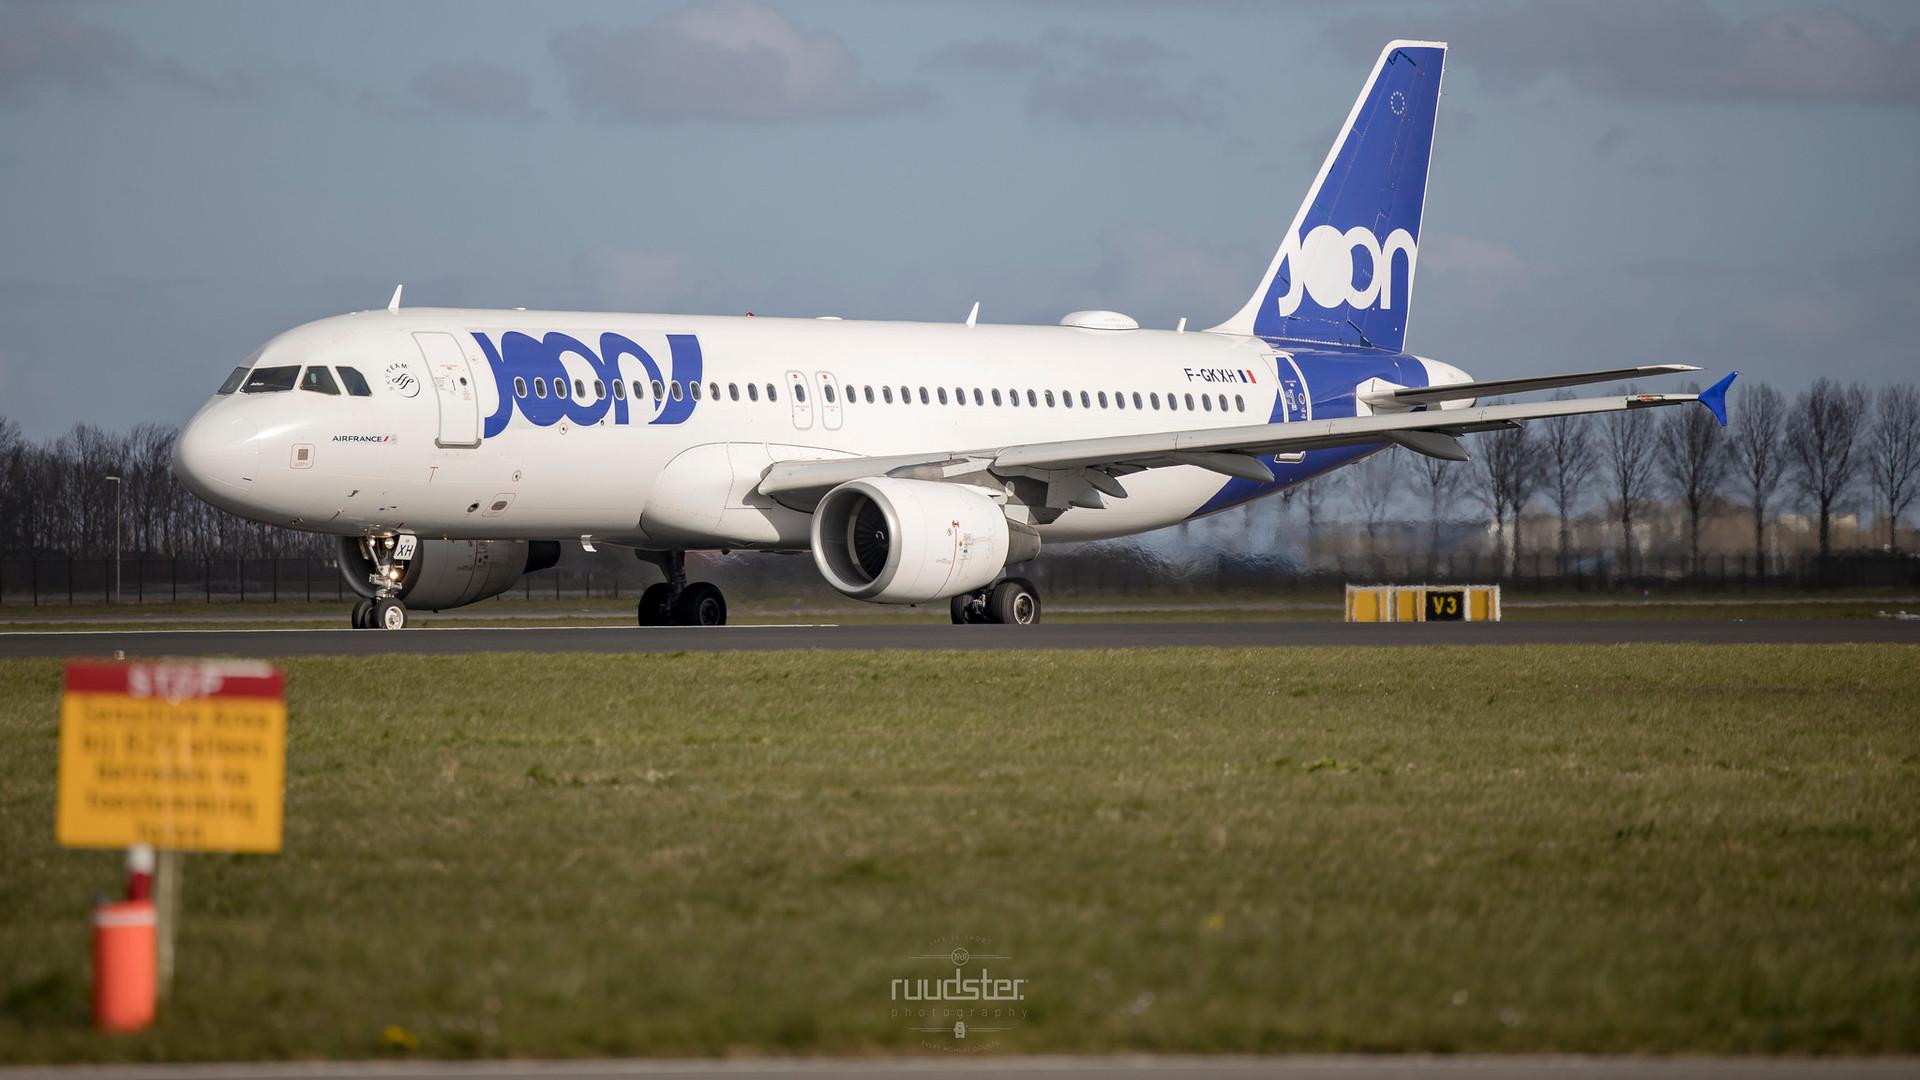 F-GKXH | Build: 2002 - Airbus A320-214